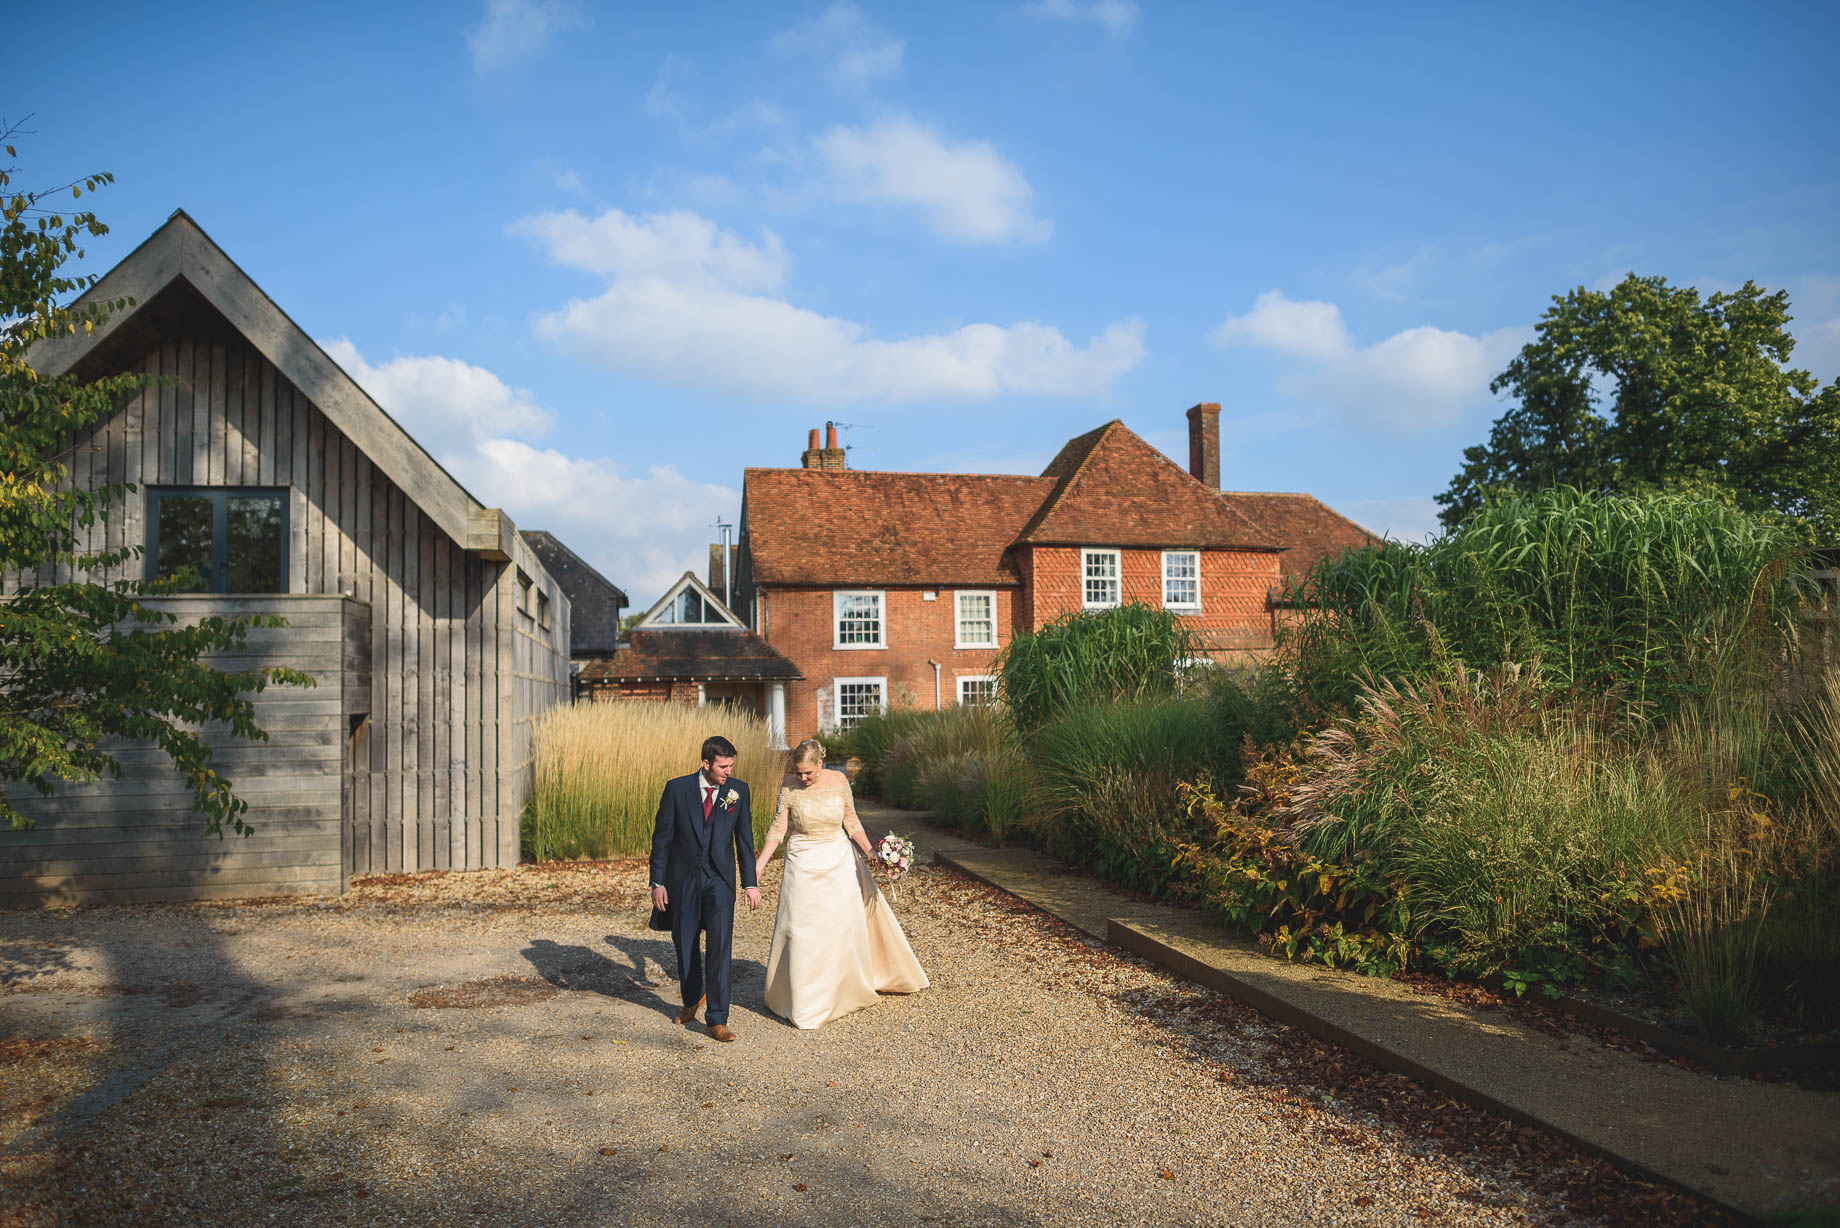 Bury Court Barn wedding photography - Guy Collier - Hannah and Mark (119 of 191)